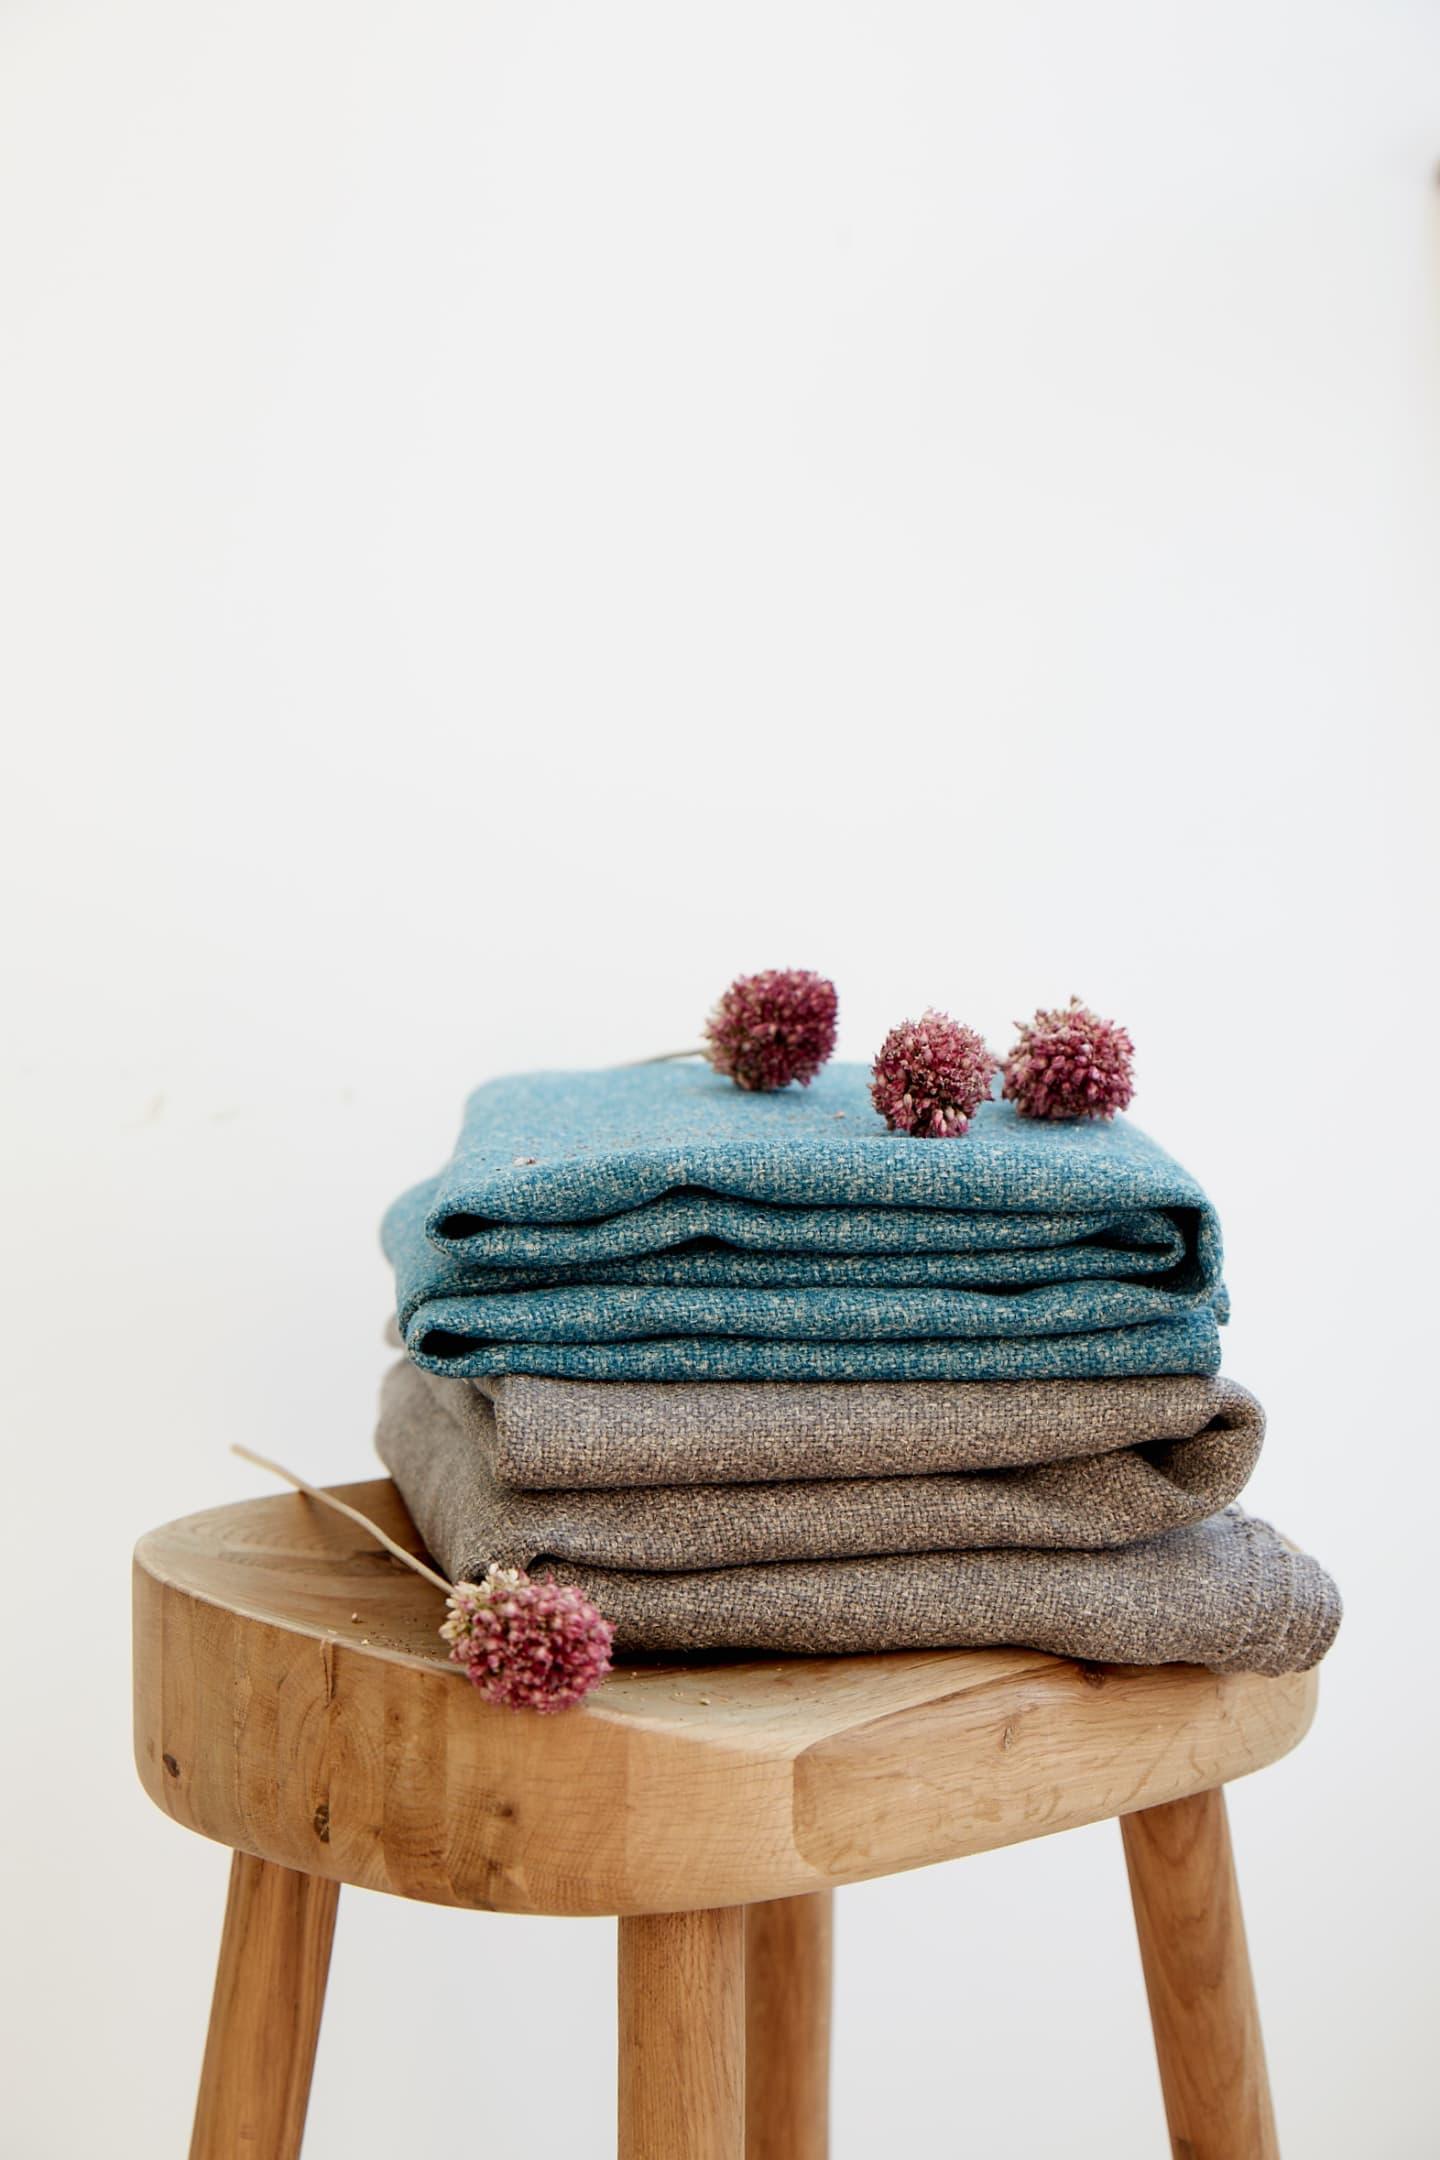 Pile of hemp fabrics with flower on top